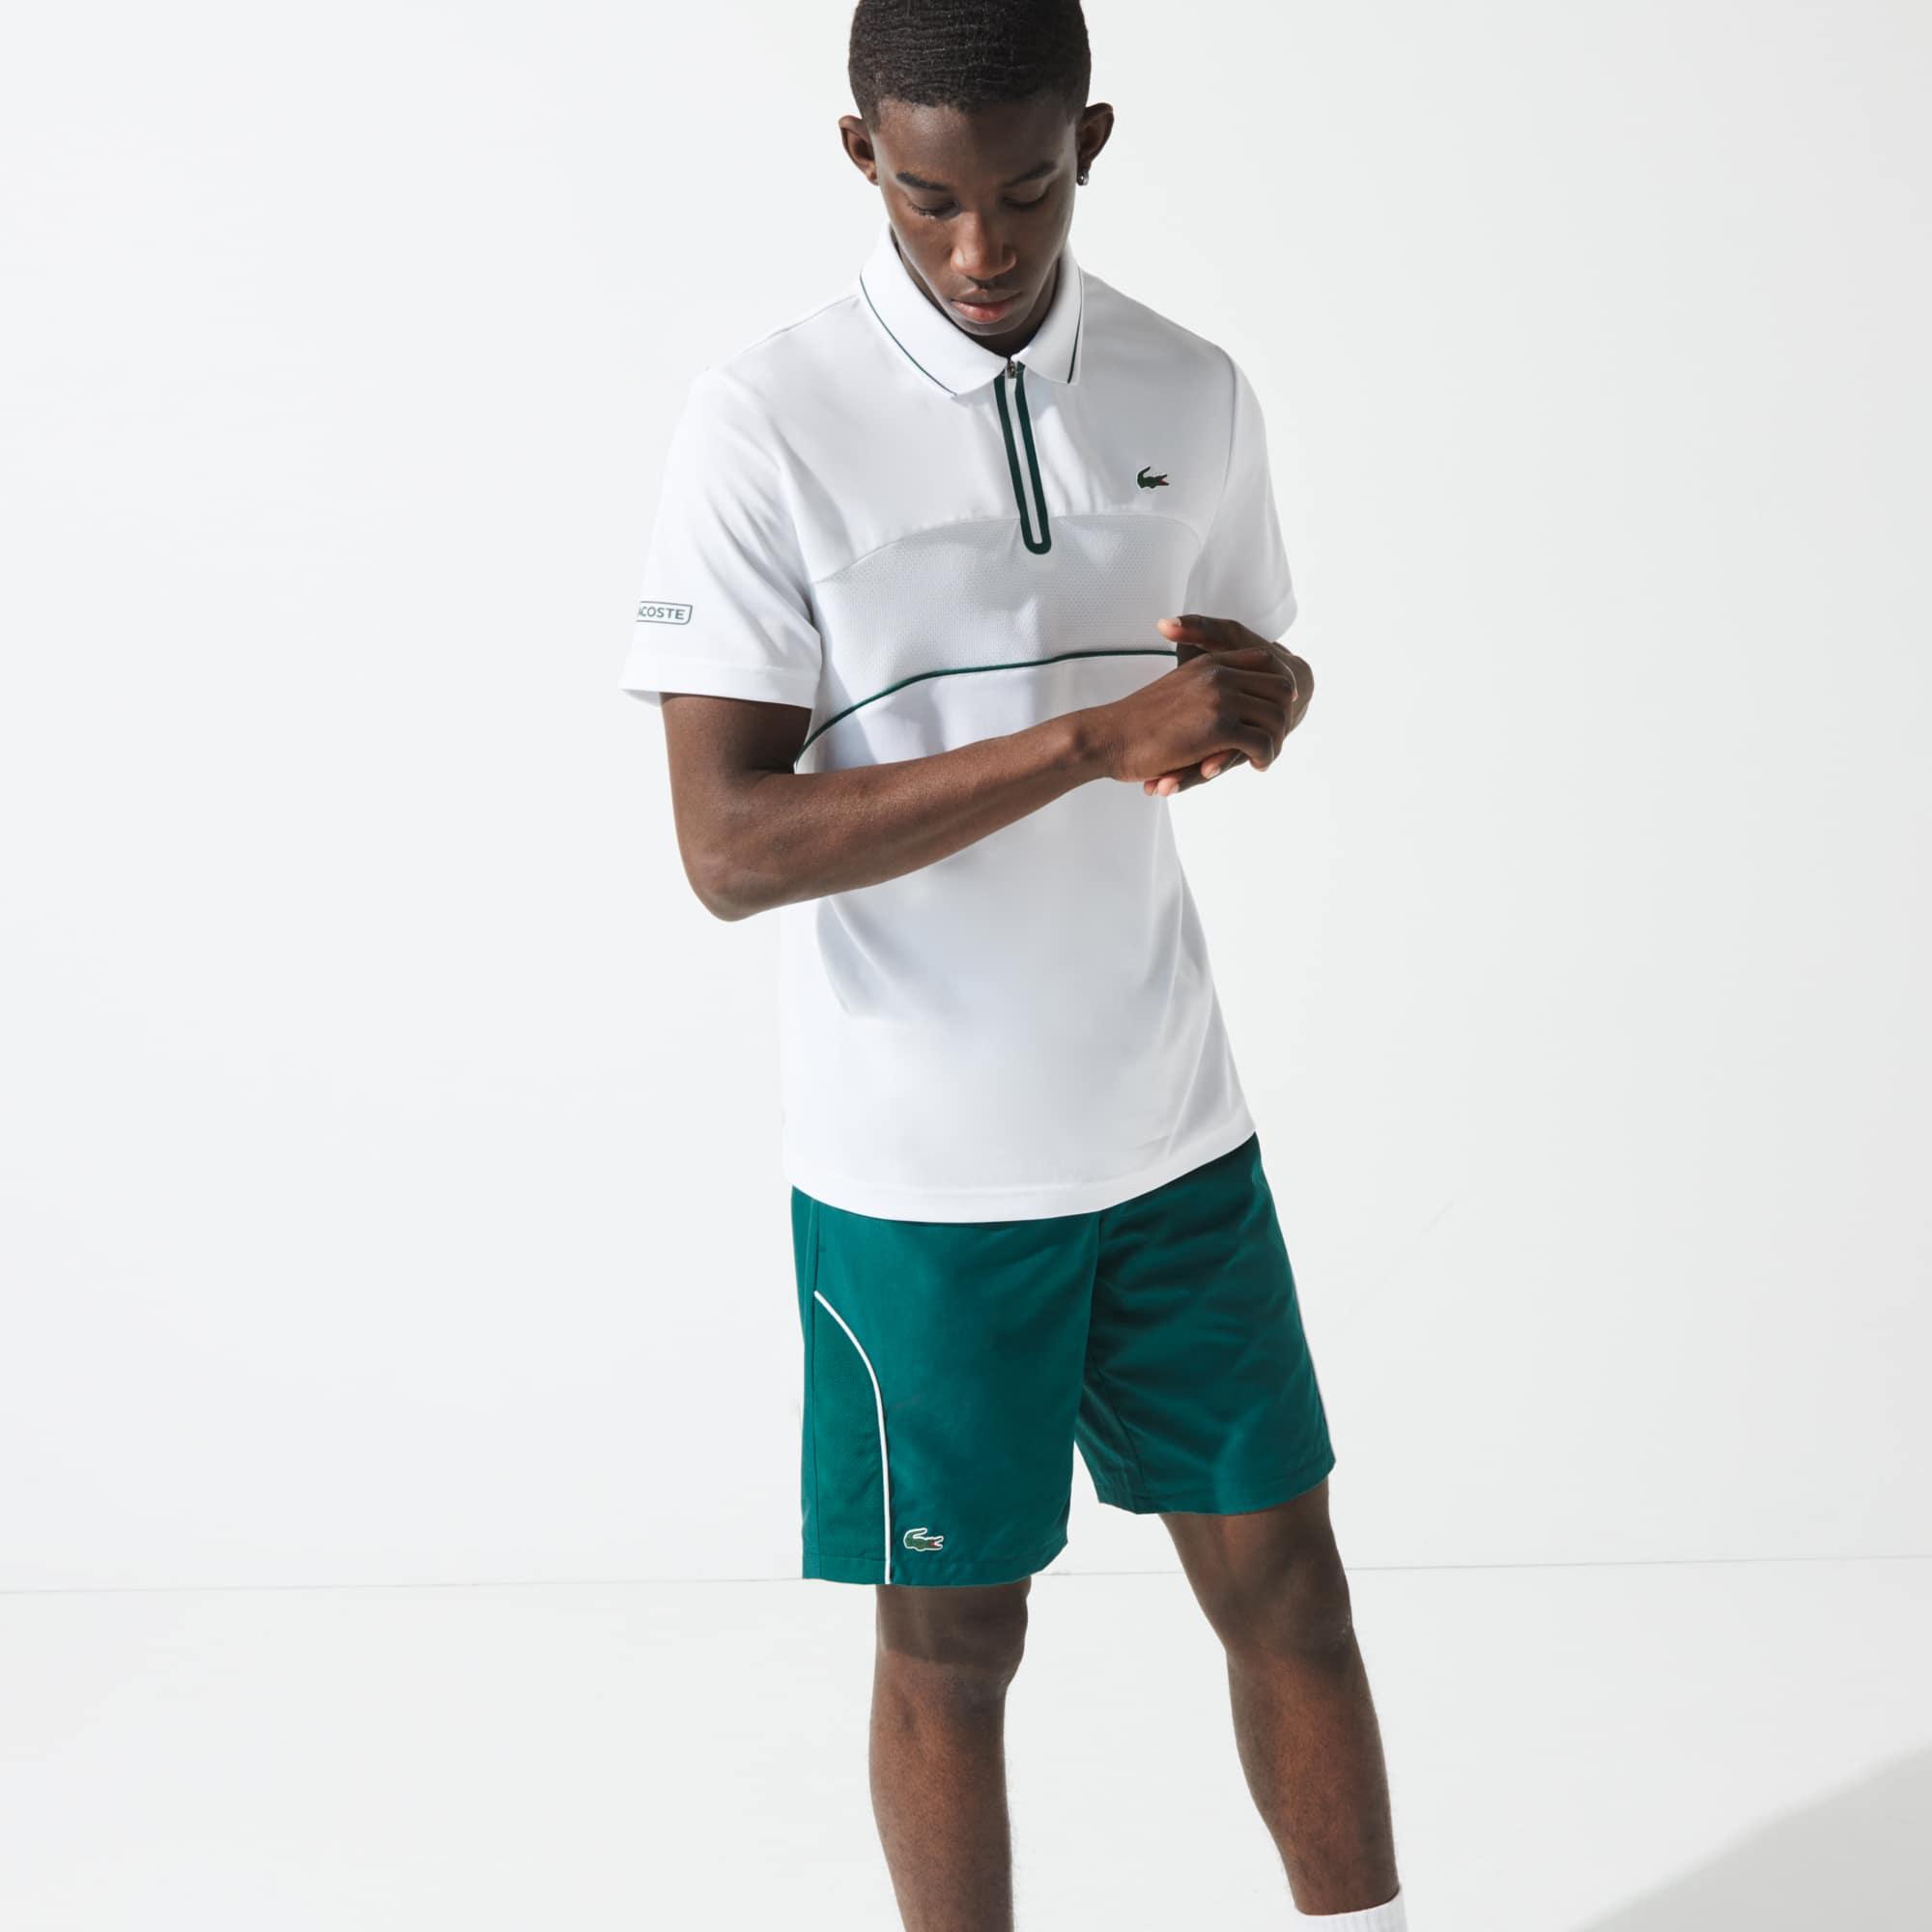 Mens 라코스테 Lacoste SPORT Court Shorts,Green / White / Black 4GW